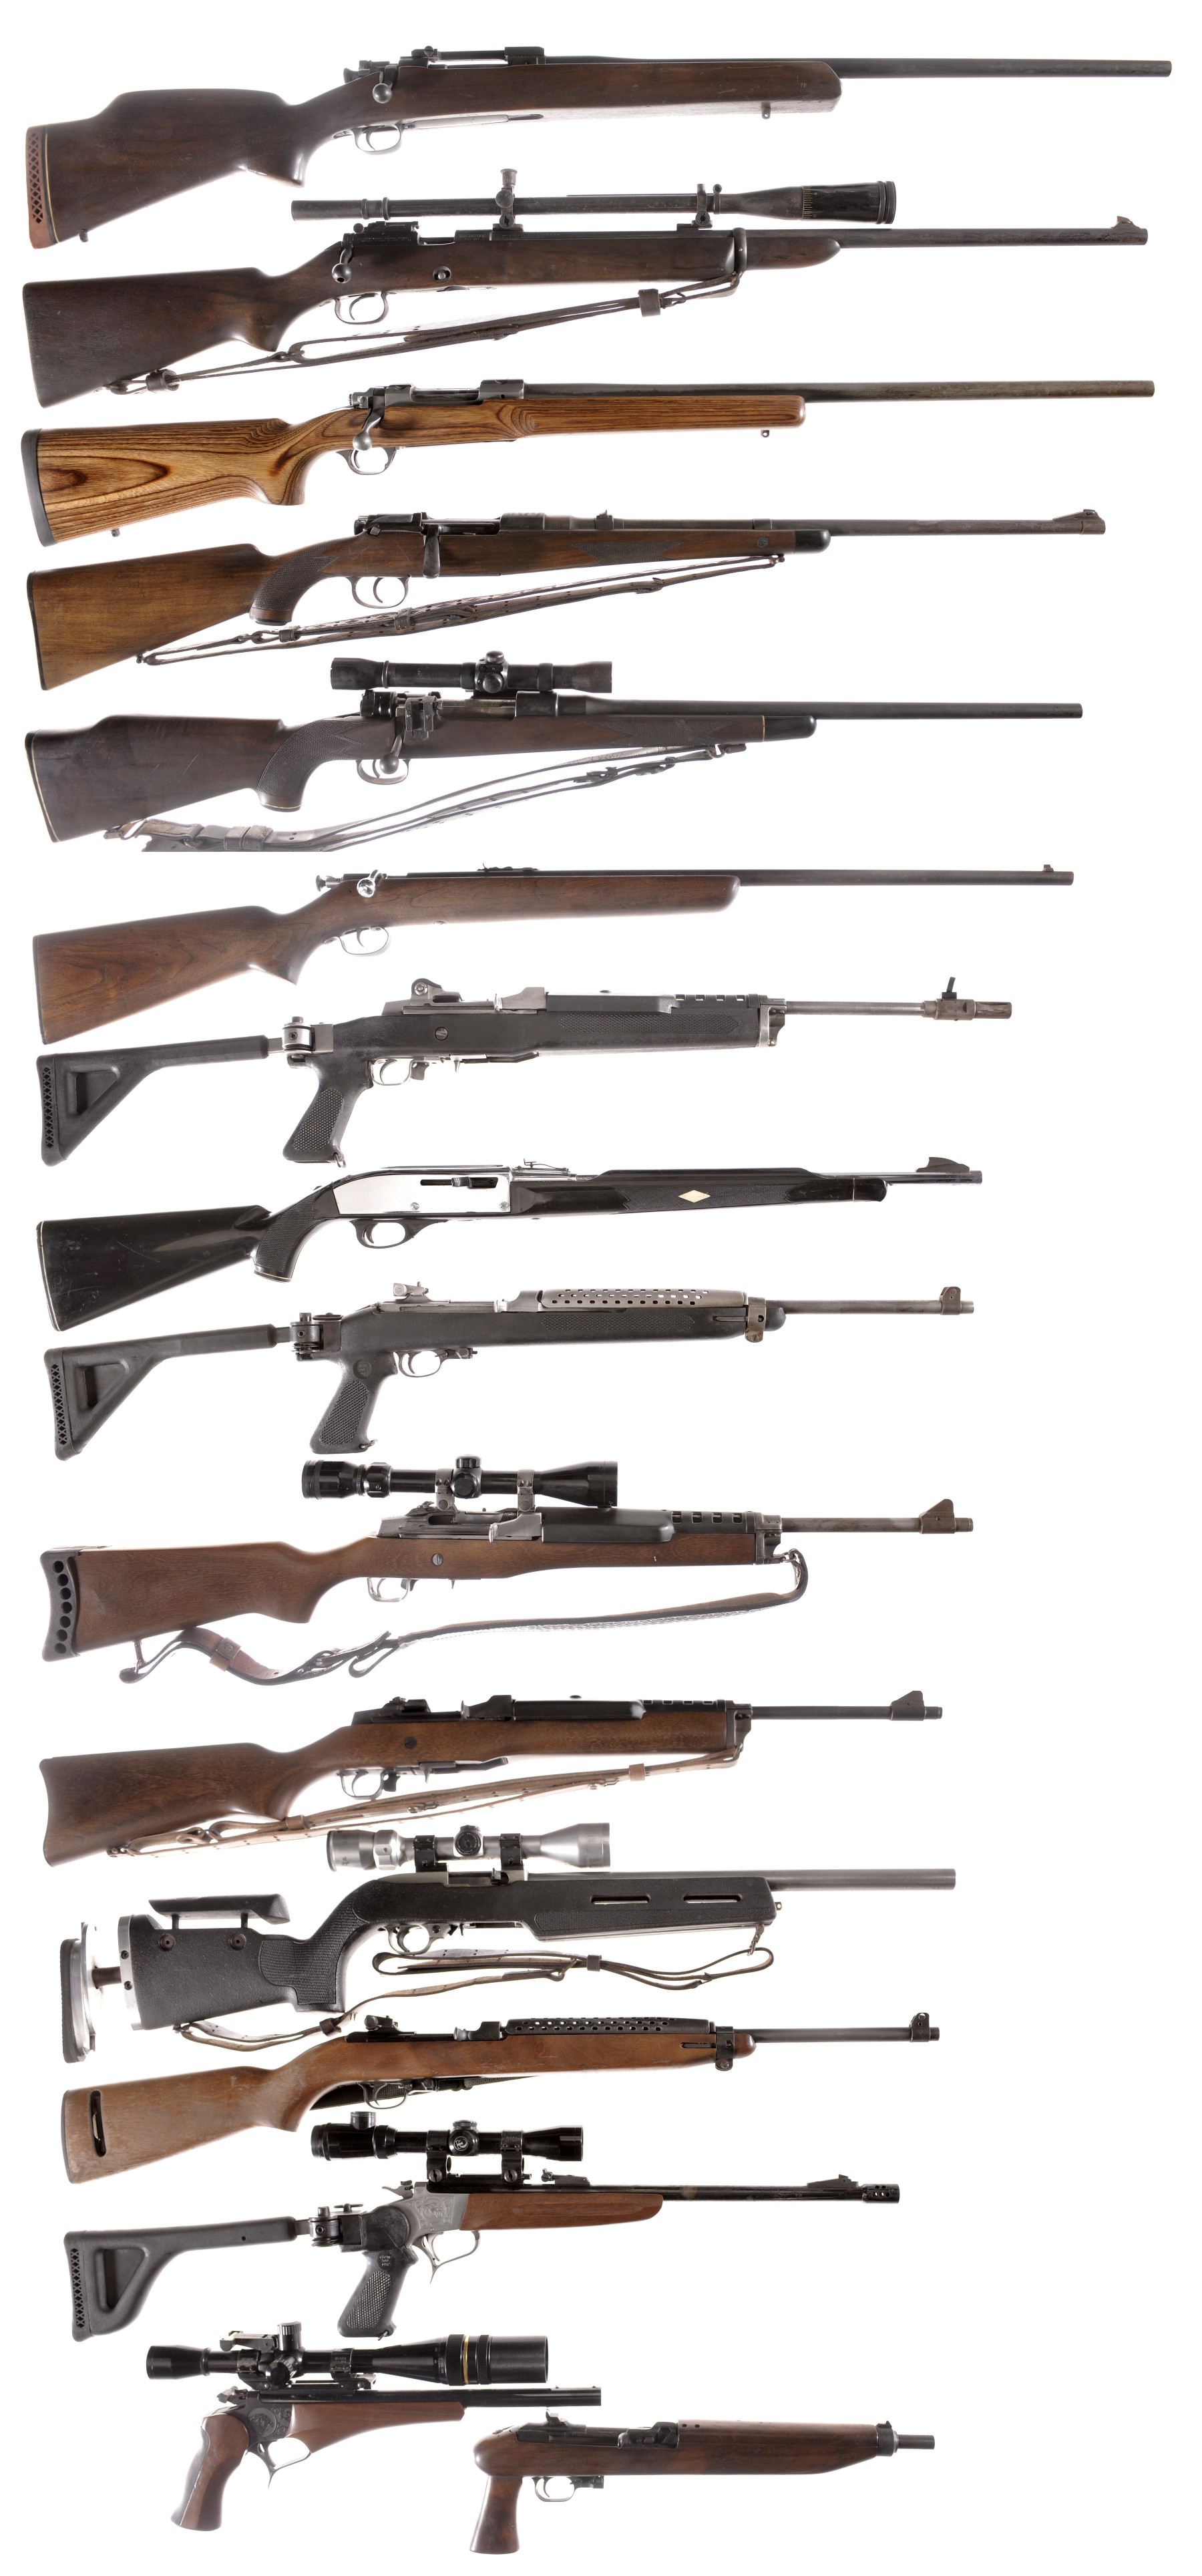 Sixteen Firearms